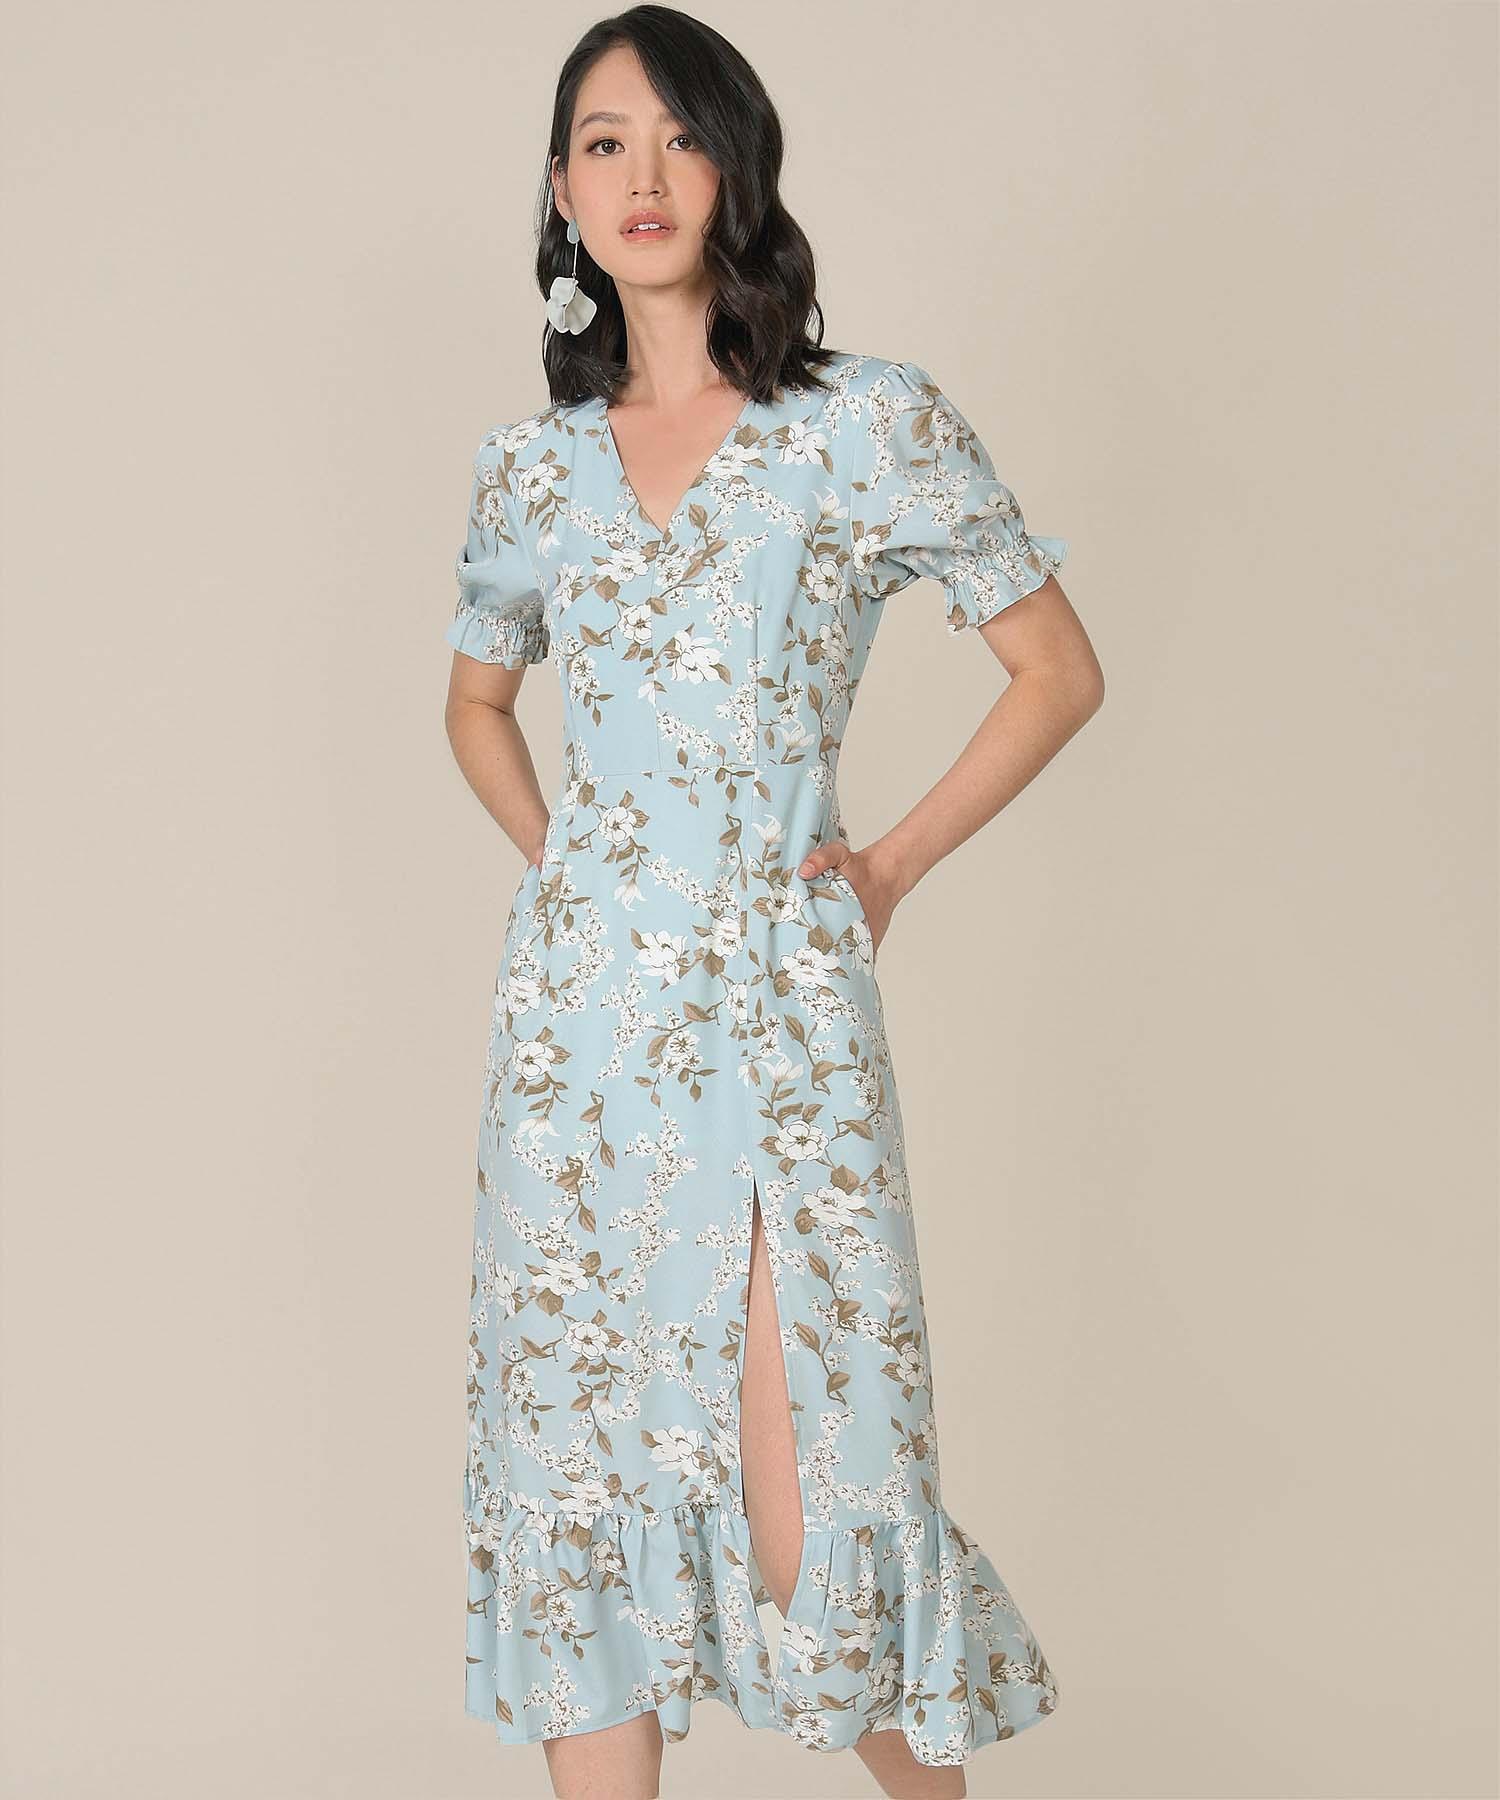 azure-floral-mermaid-midi-dress-pale-blue-1